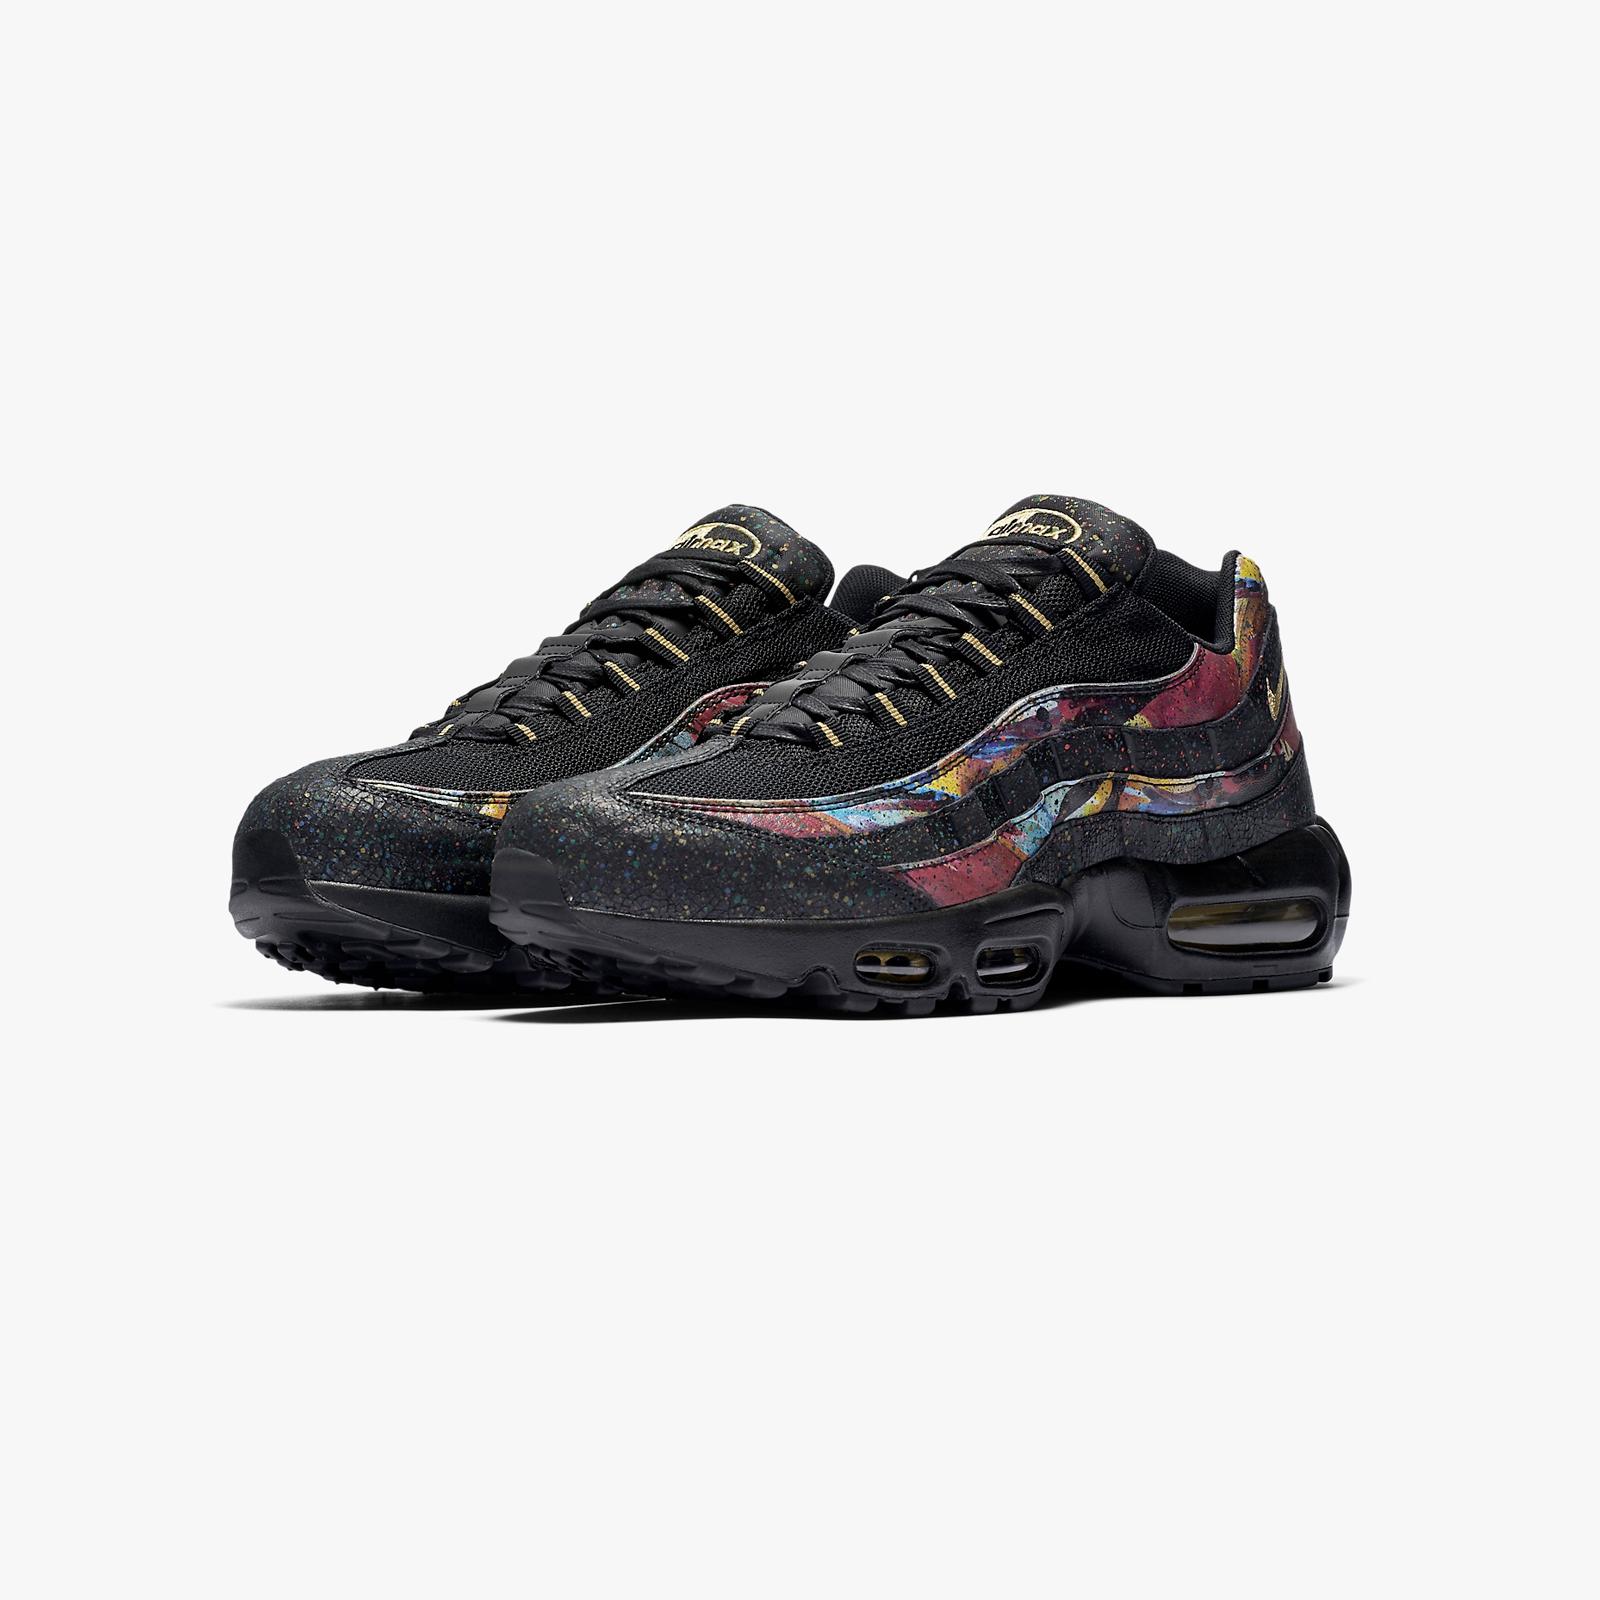 Nike Air Max 95 At6142 001 Sneakersnstuff | sneakers